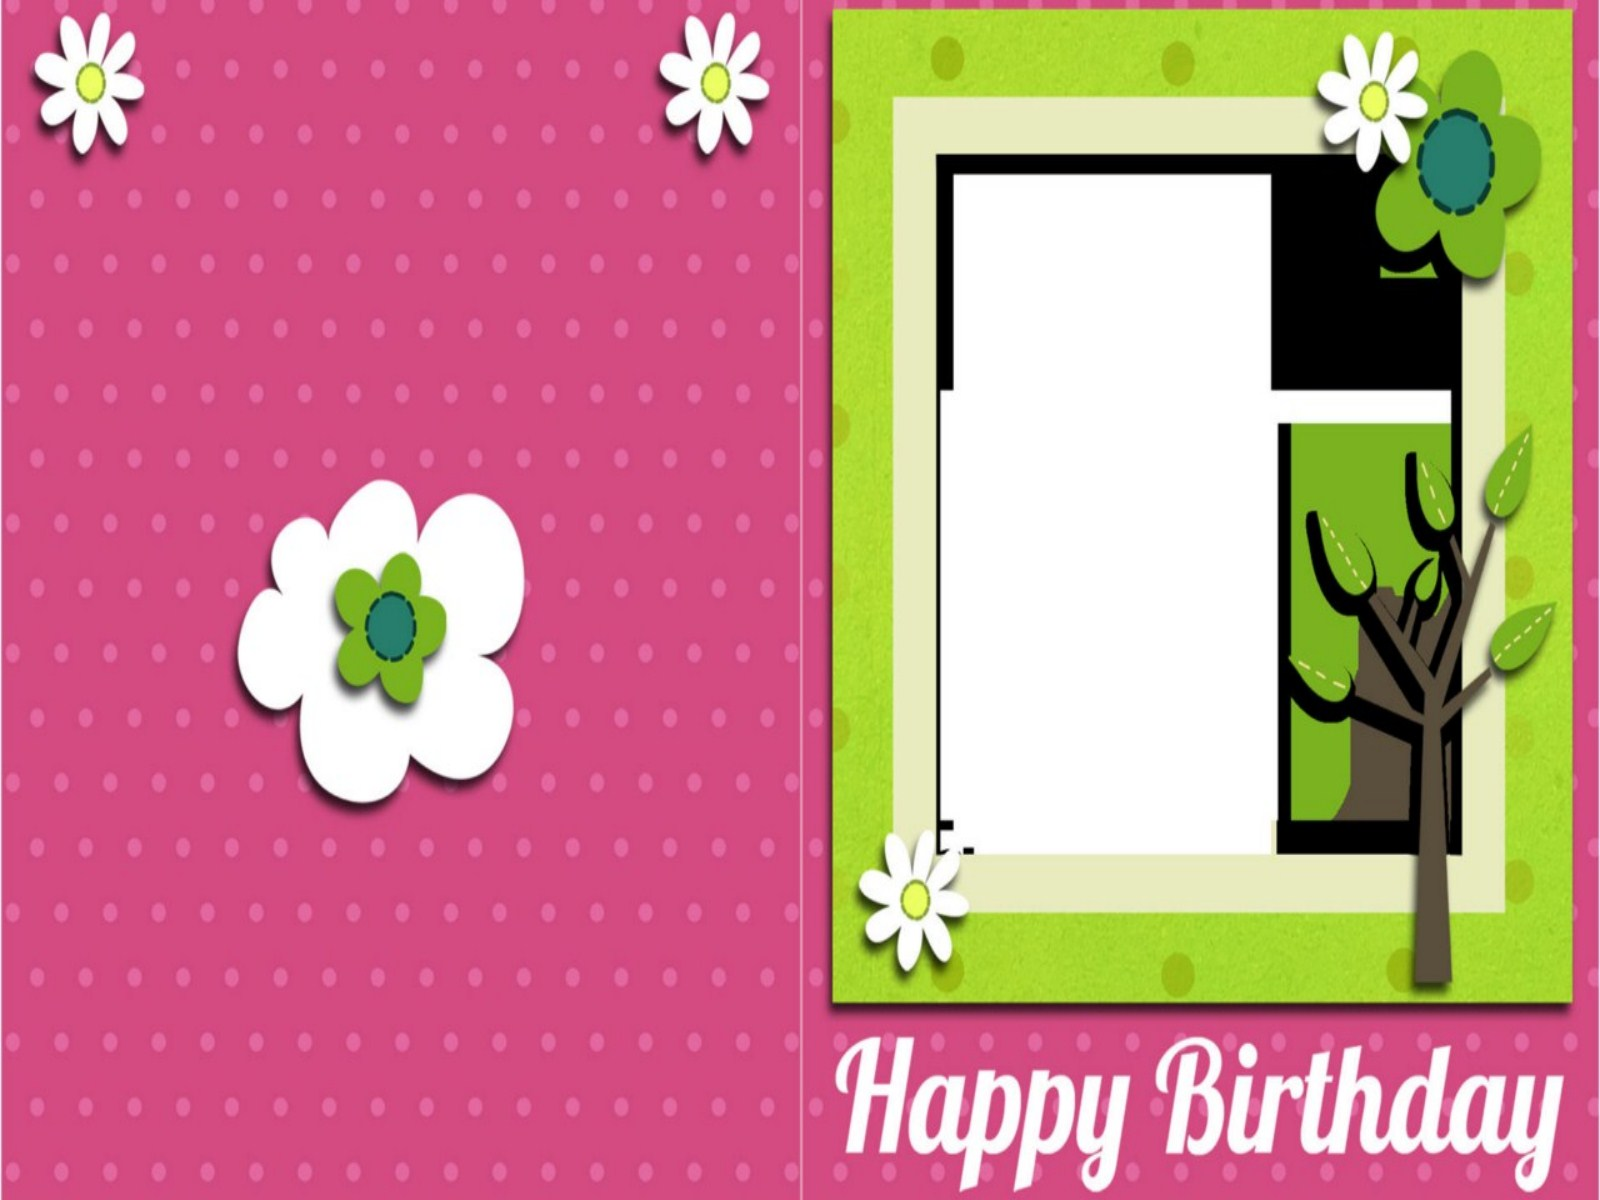 Birthday Card Wallpaper WallpaperSafari – Birthday Cards Backgrounds